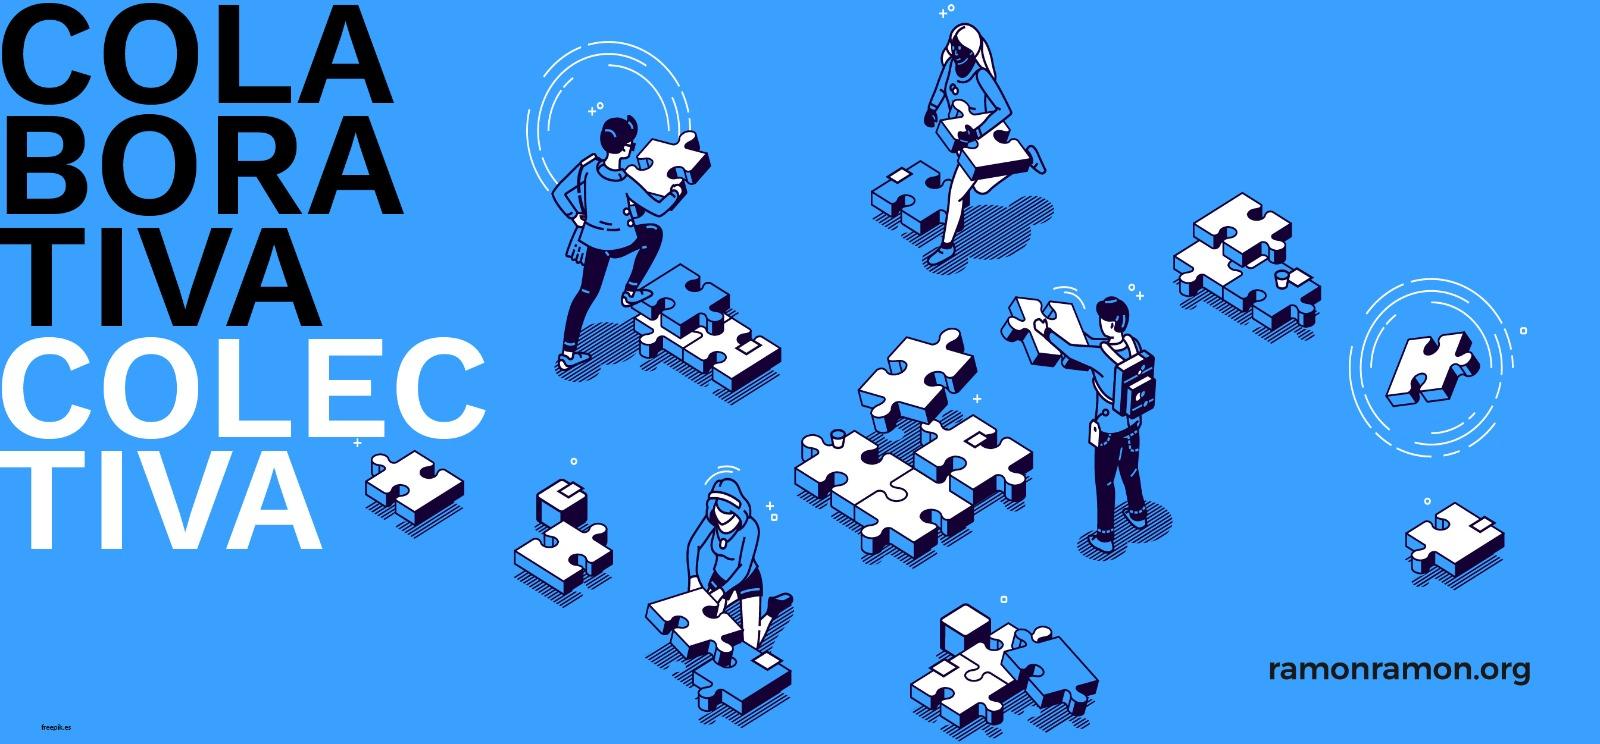 innovación colaborativa